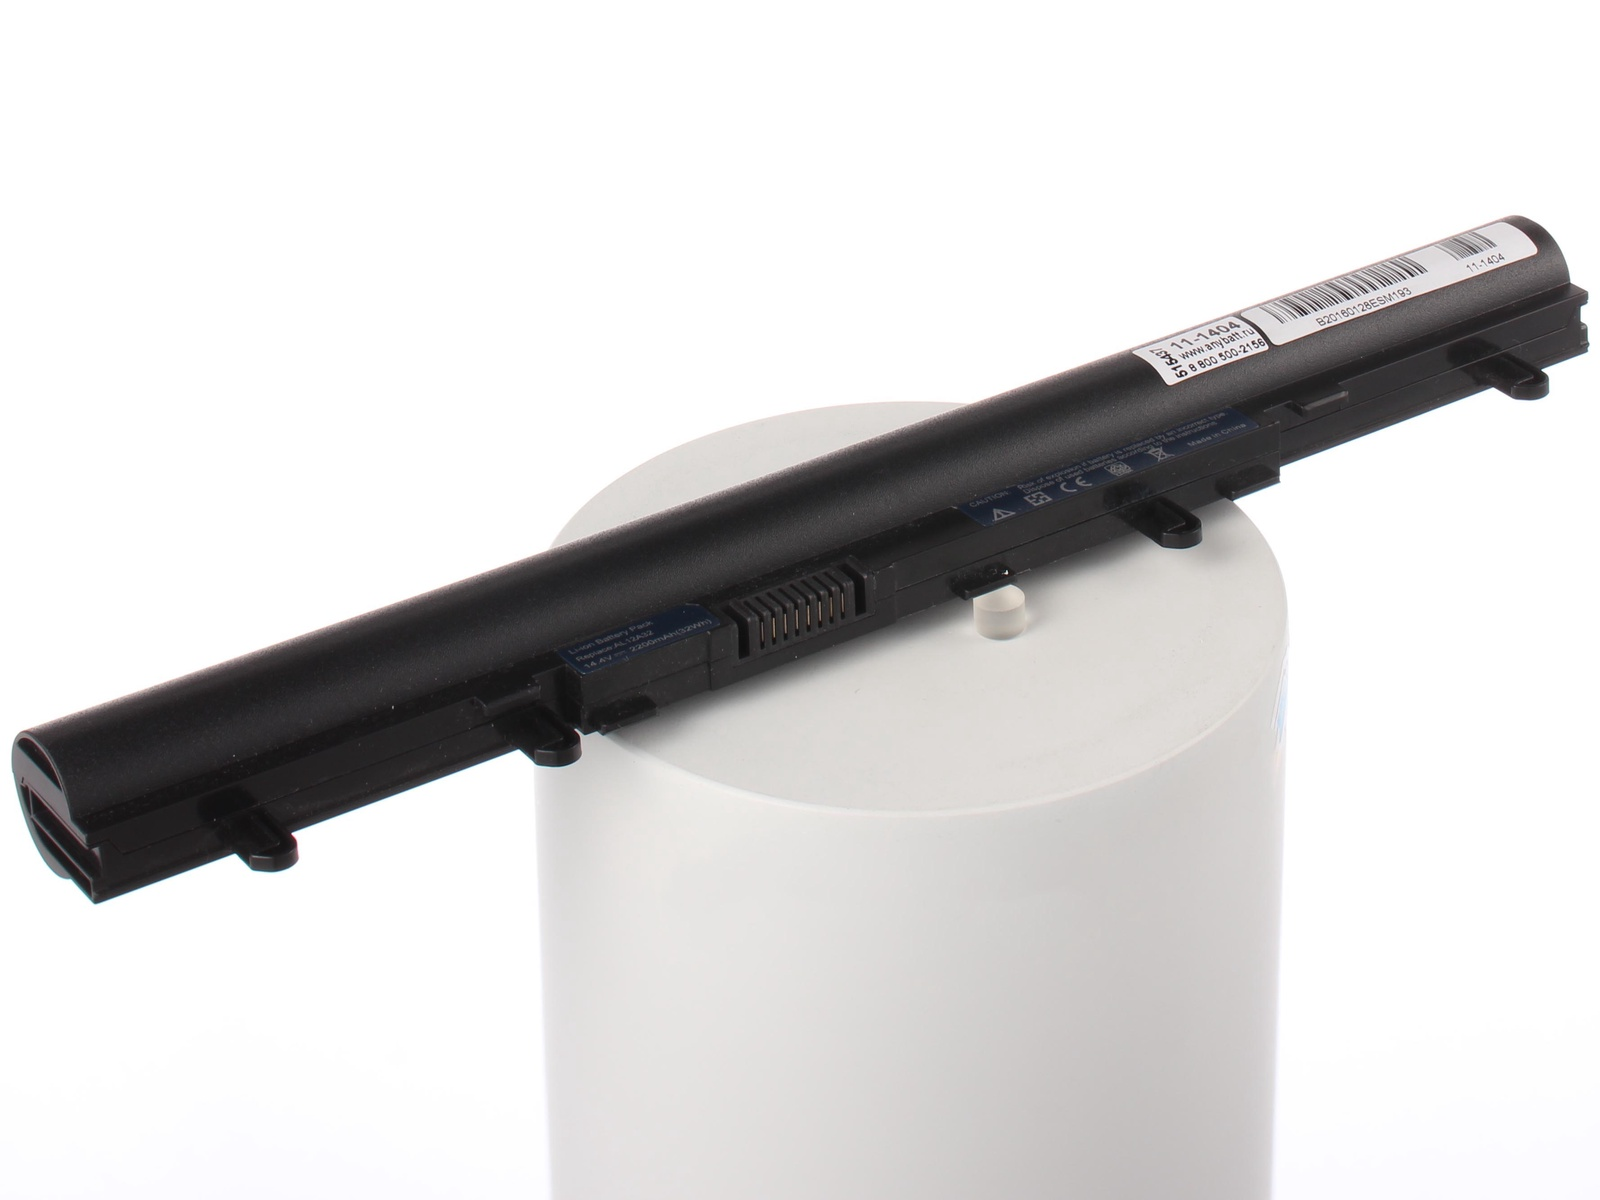 Аккумулятор для ноутбука AnyBatt для Acer Aspire E1-522-12504G32Mnkk, Aspire E1-572G-54206G75Mnii, Aspire F5-571G-341W, Aspire V5-471G-53334G50Ma, Aspire V5-551-84554G50Ma, Aspire V5-571G-33214G50Mabb, Aspire V5-571G-33224G50Mass аккумулятор для ноутбука anybatt для acer aspire e1 532g 35584g50mnkk aspire e1 570g 33214g32mnkk aspire v5 571pg 73536g75ma aspire e1 470p 6659 aspire e1 522 12504g50mn aspire e1 522 45004g1tmn aspire e1 570g 33214g50mnii